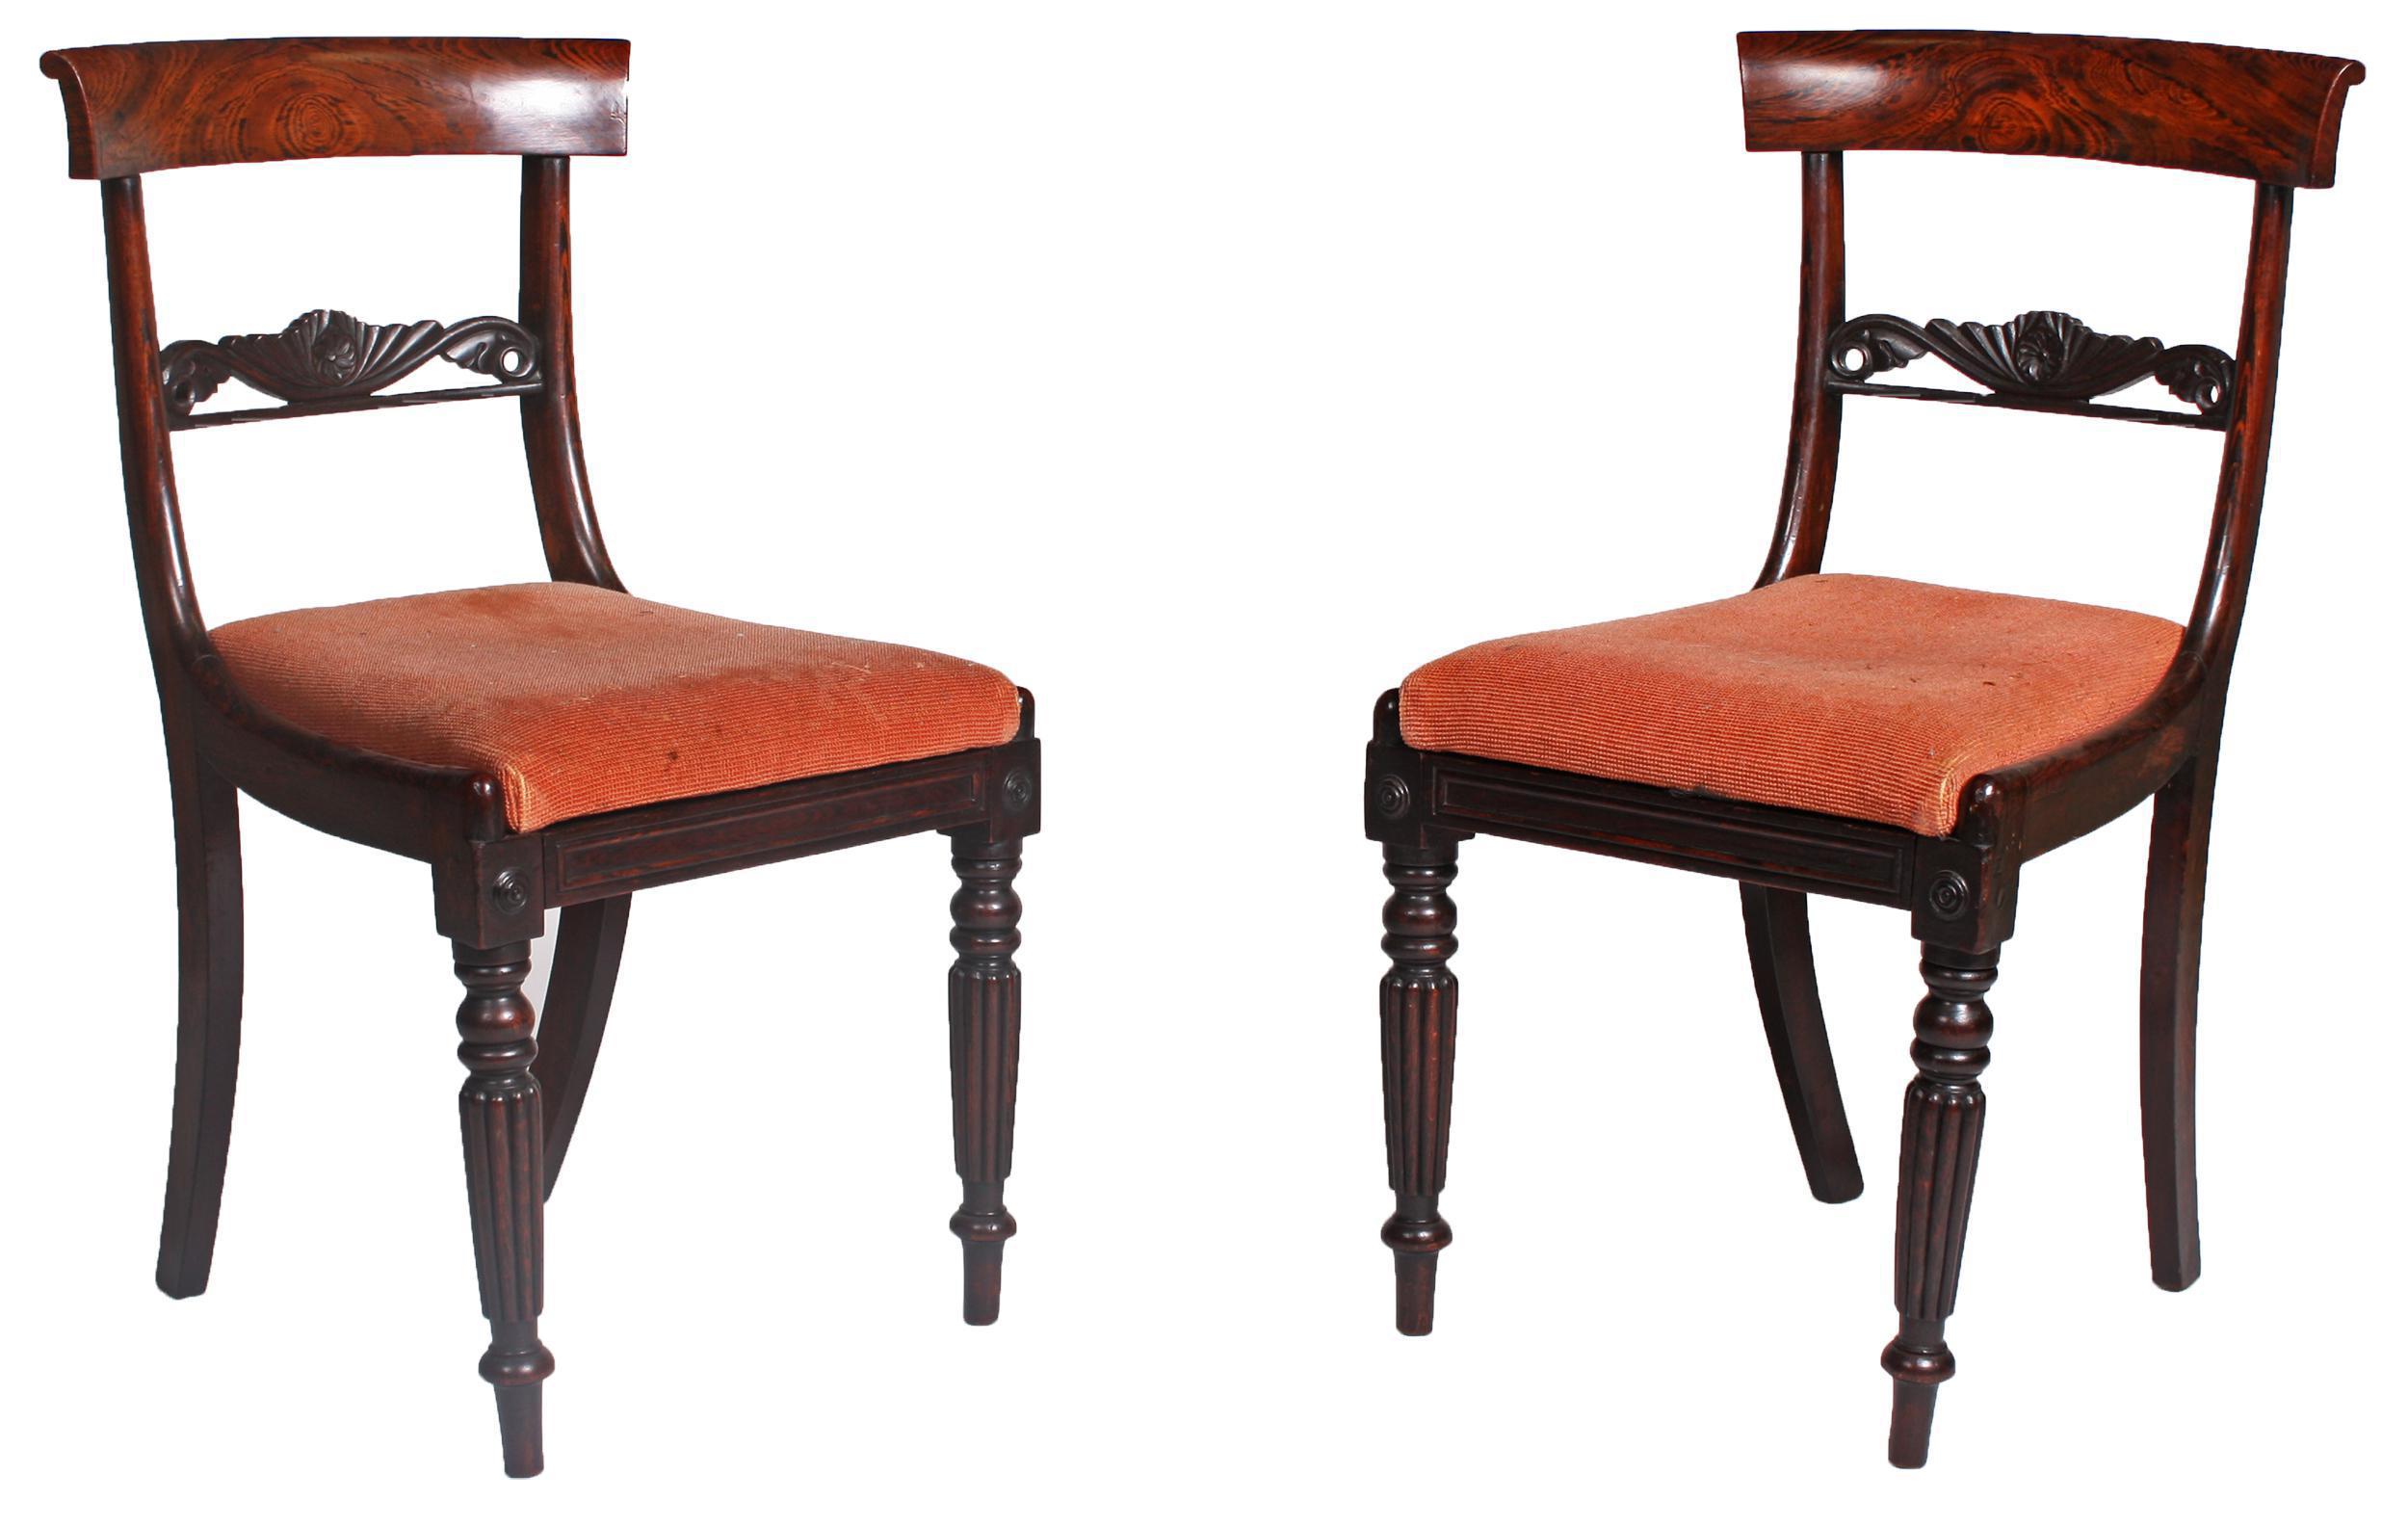 1820s Faux Bois Regency Chairs For Sale